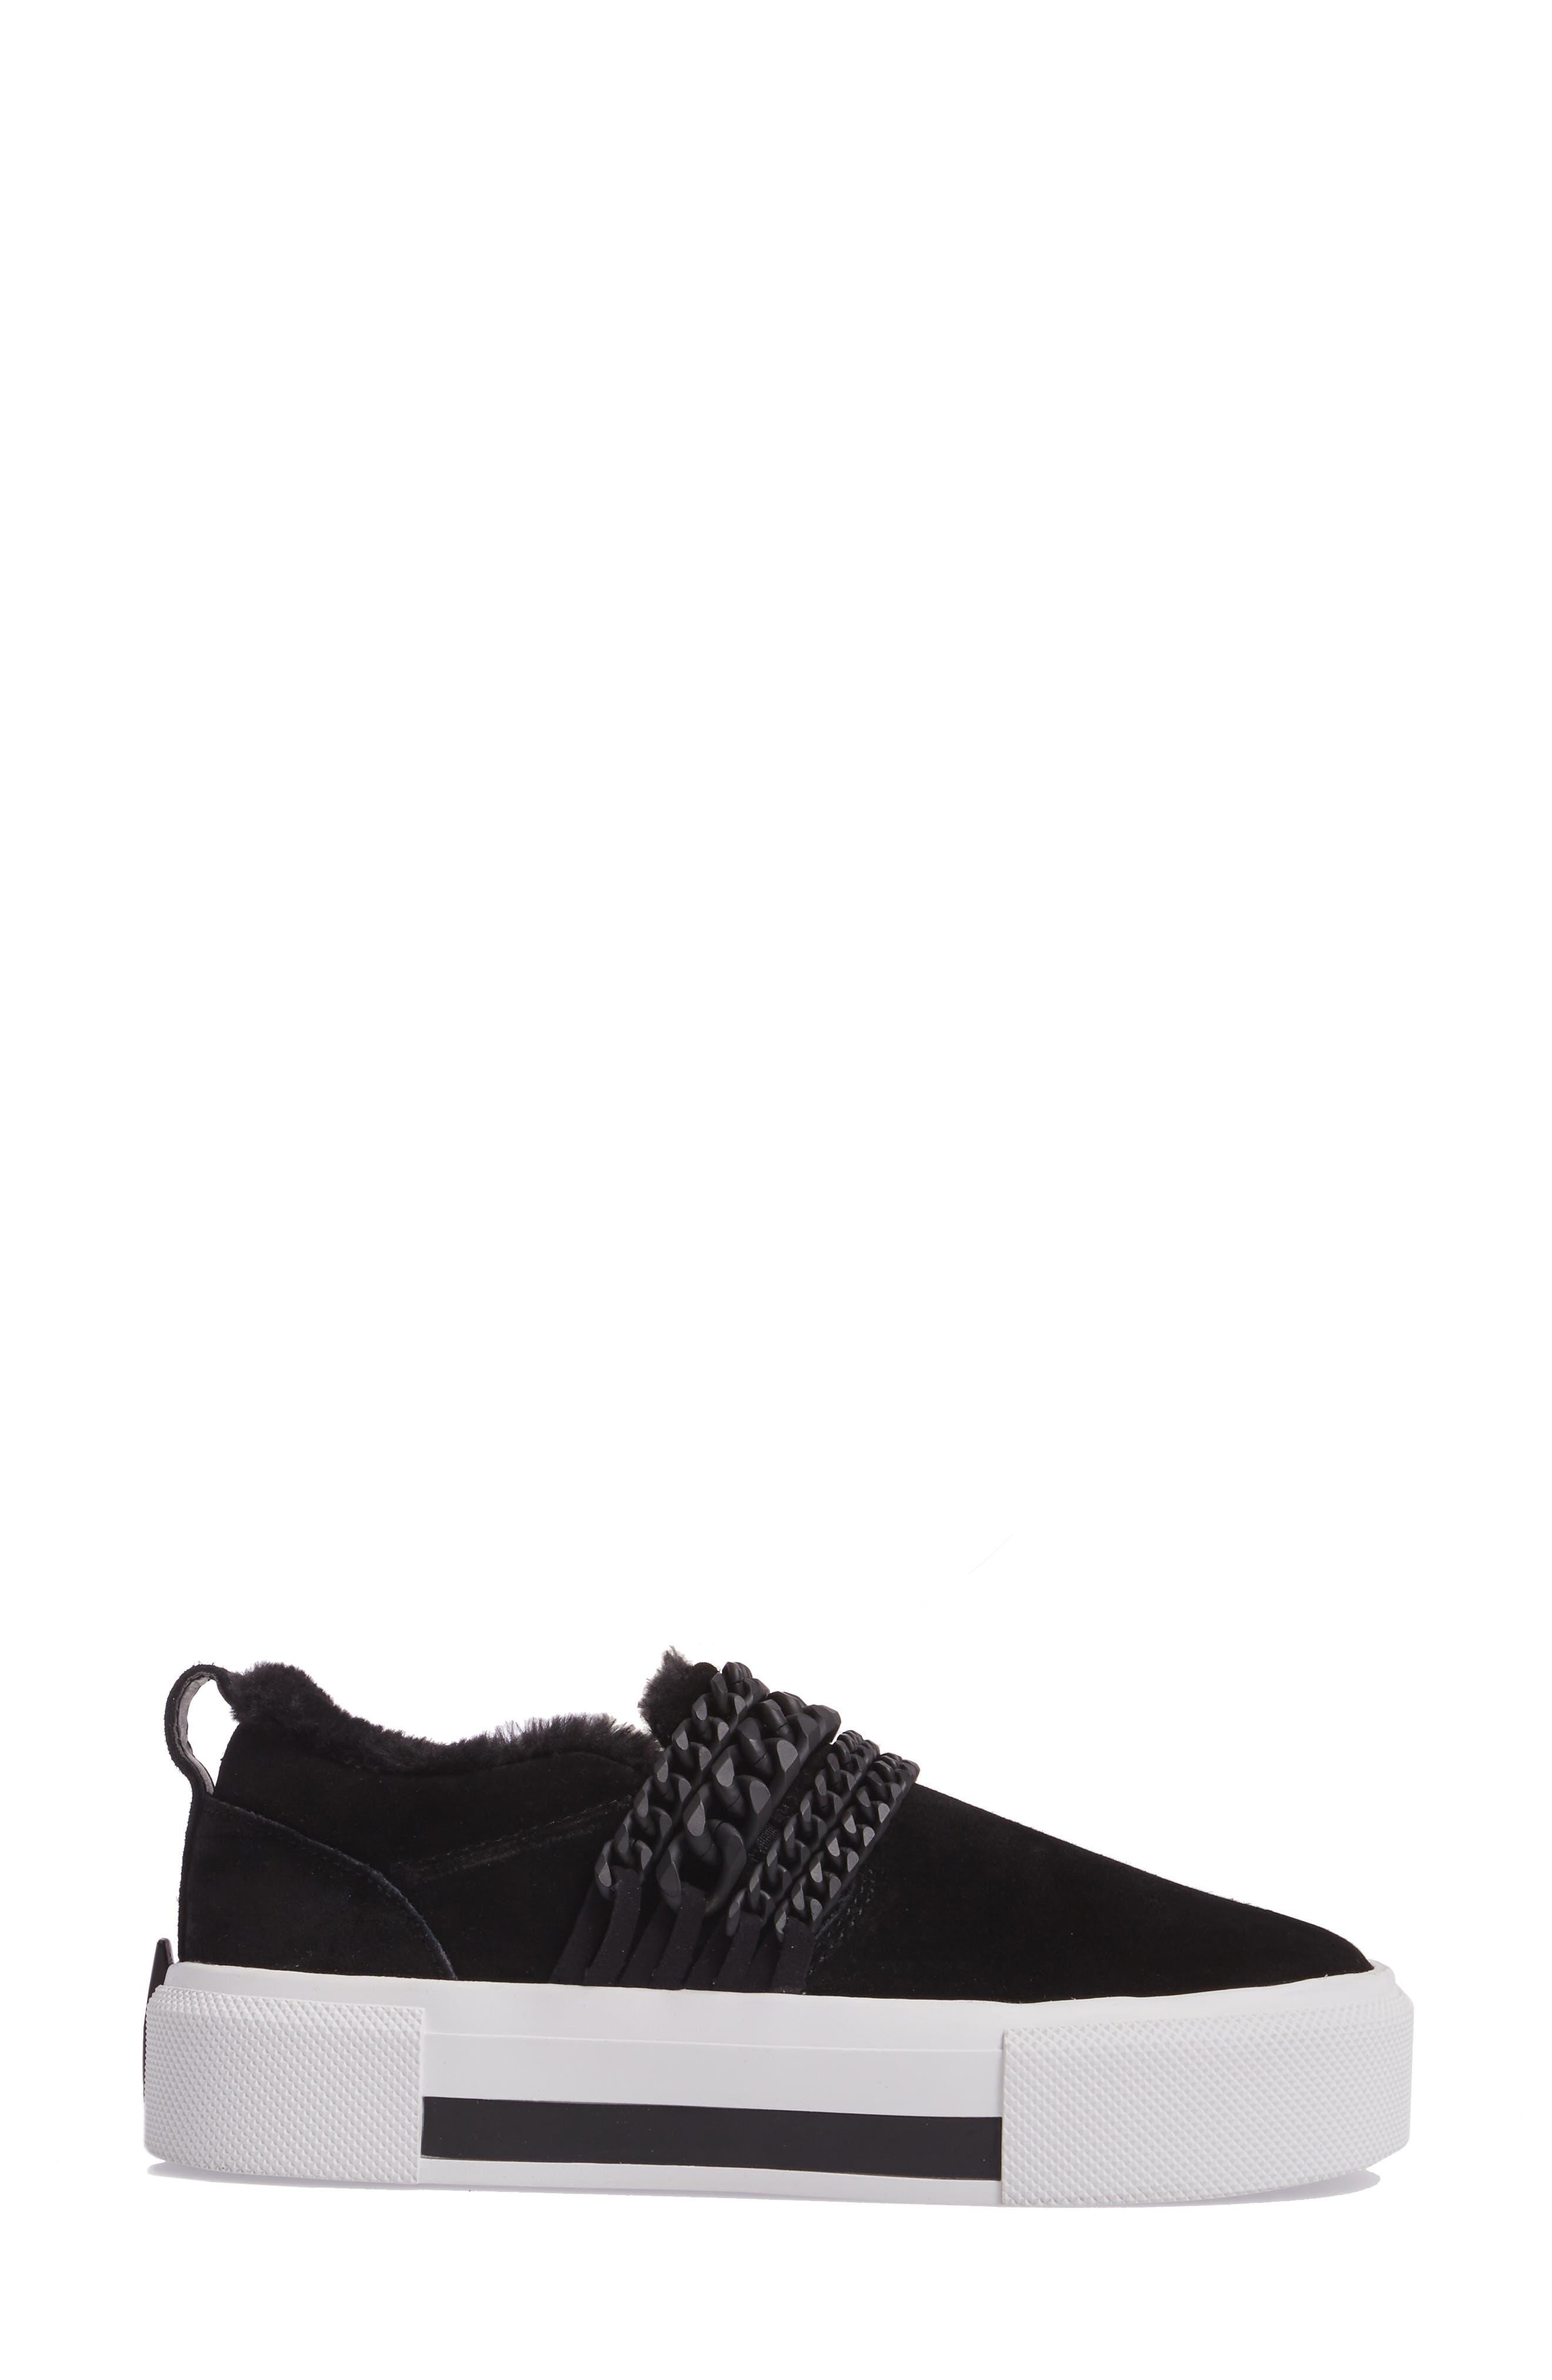 Tory Platform Sneaker,                             Alternate thumbnail 3, color,                             Black